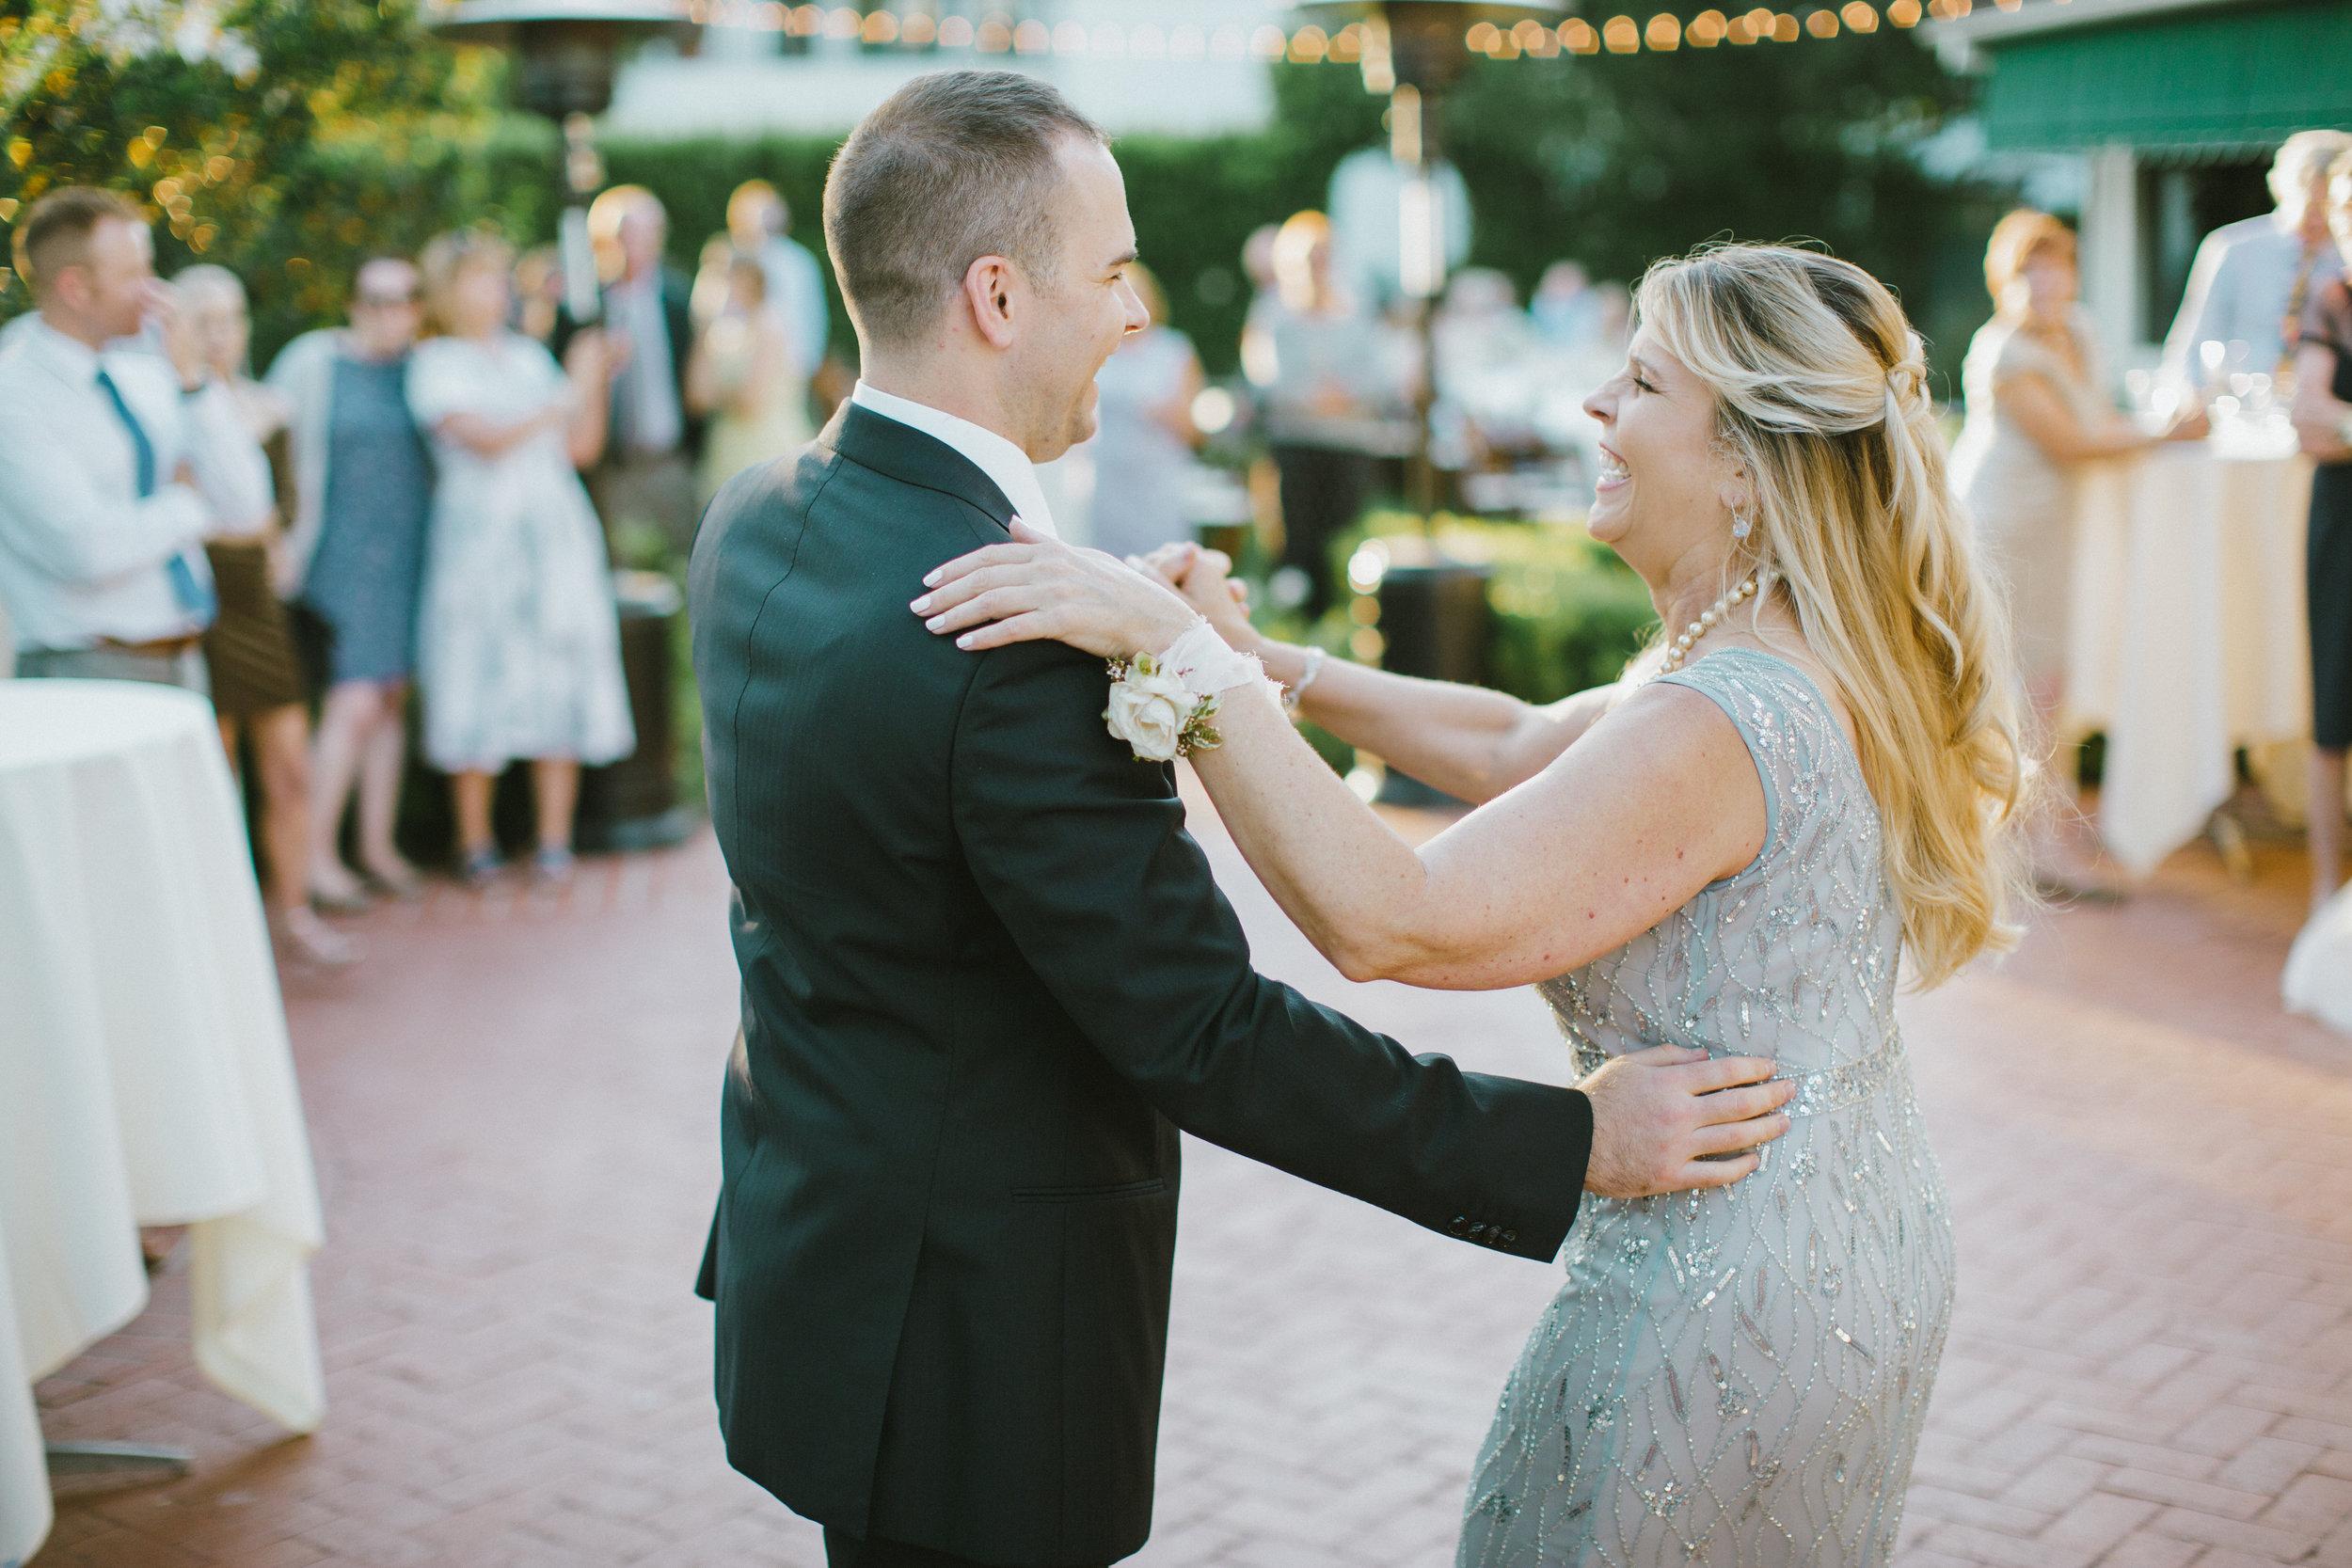 www.santabarbarawedding.com | Ryanne Bee Photography | The Santa Barbara Club | The Wedding Expert DJ | Groom Shares a Dance with His Mom